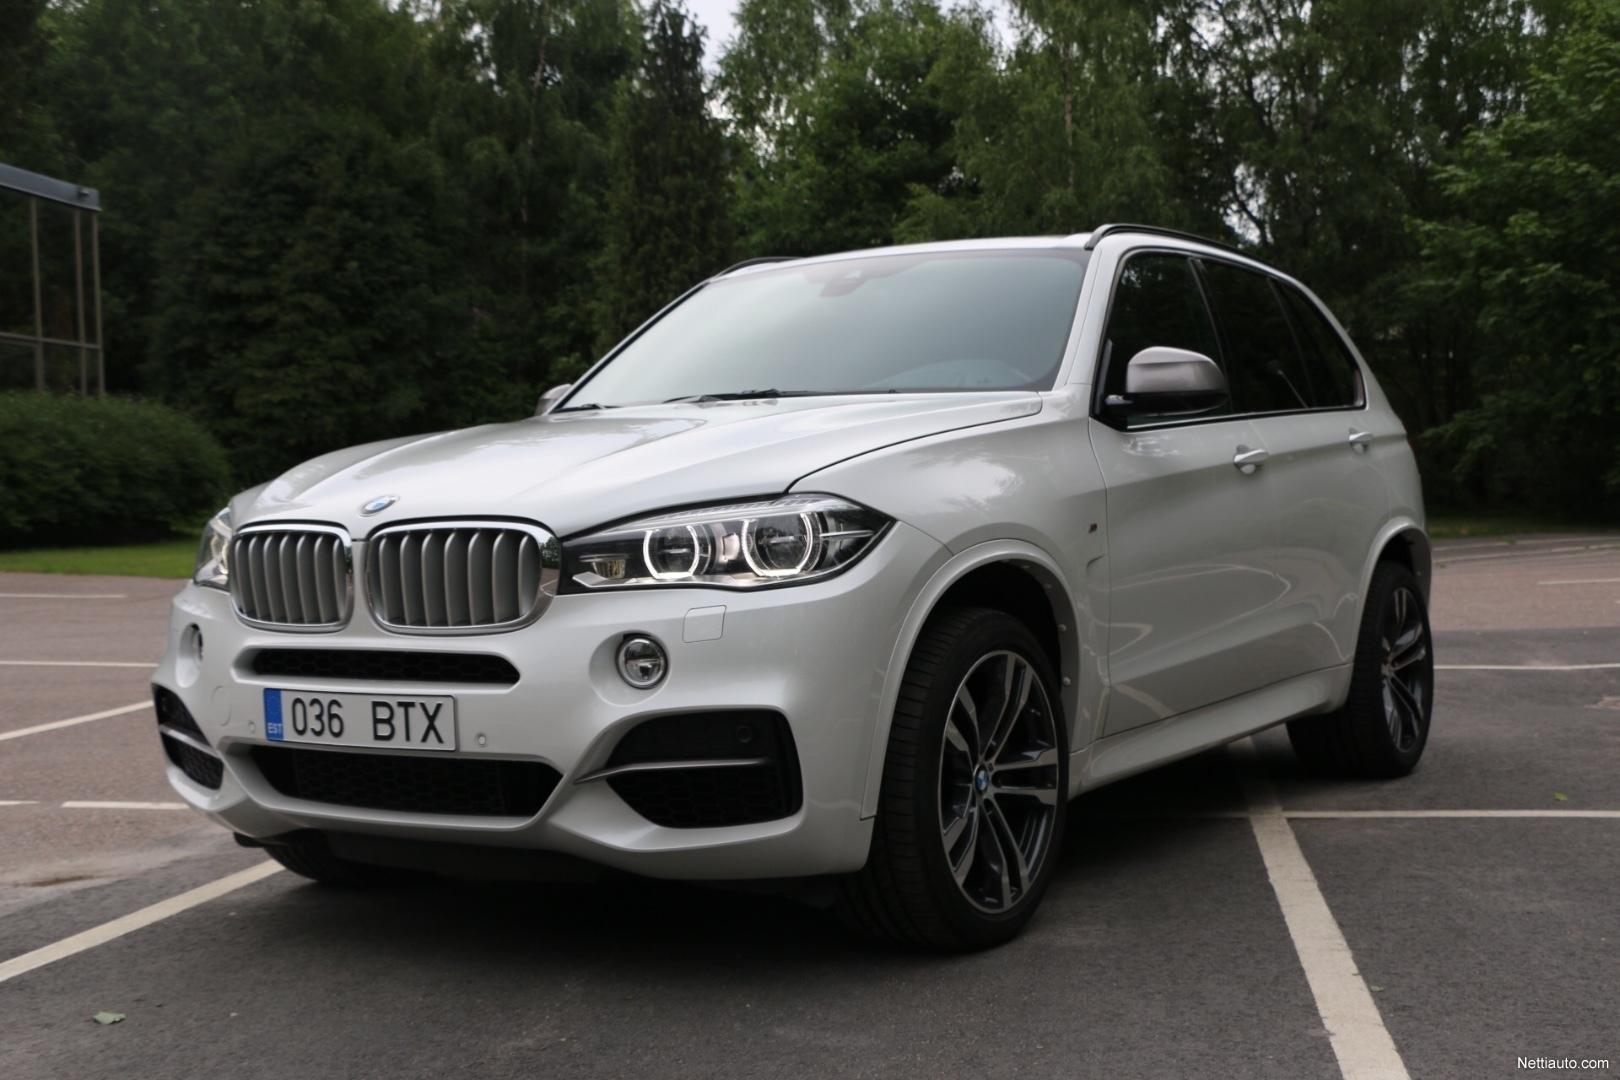 BMW X5 F15 M50d 4x4 2015 - Used vehicle - Nettiauto